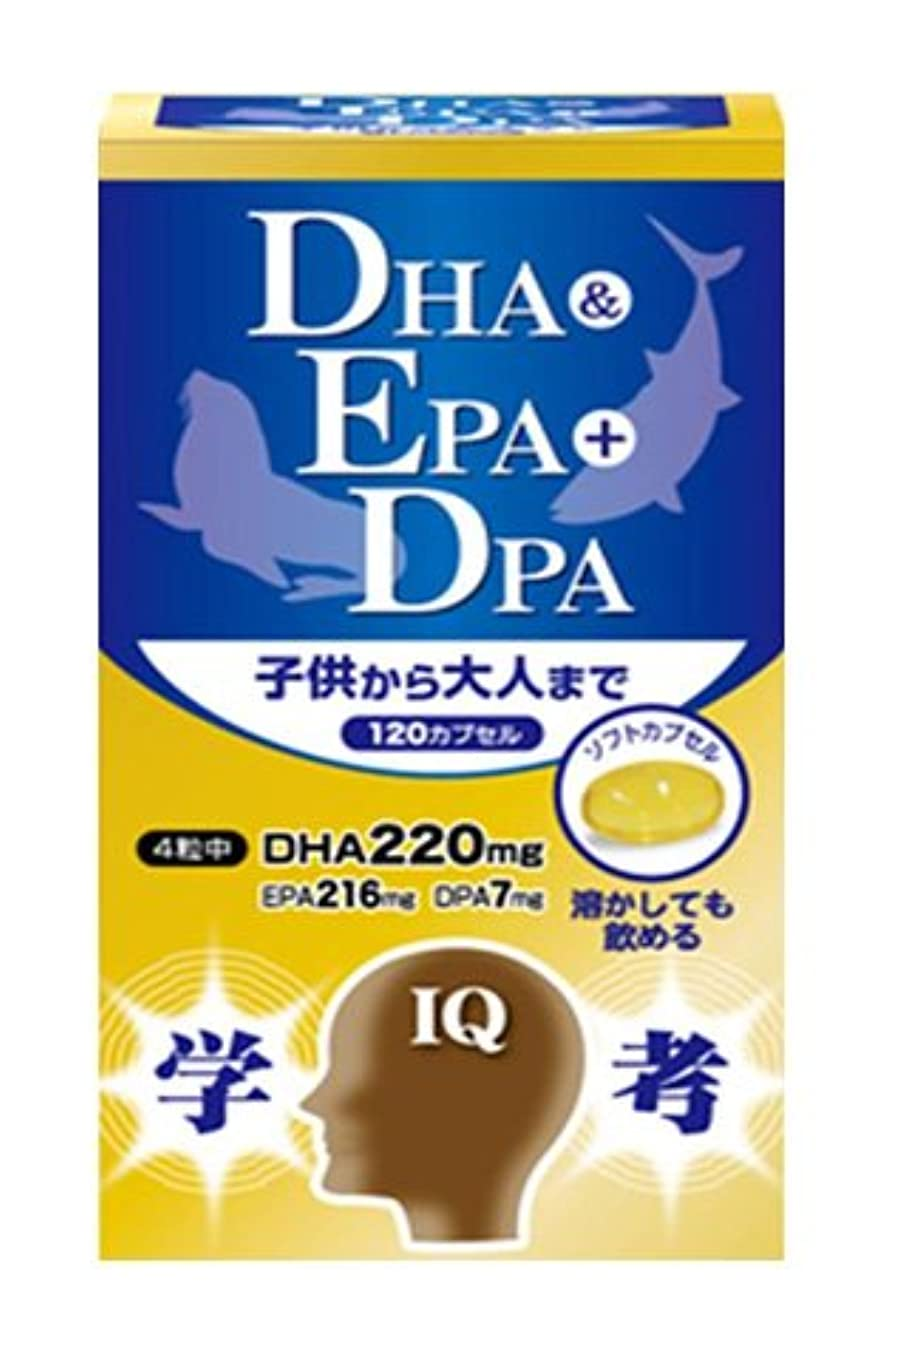 胆嚢警官無力三供堂漢方 DHA&EPA+DPA 290mg×120粒×10個セット